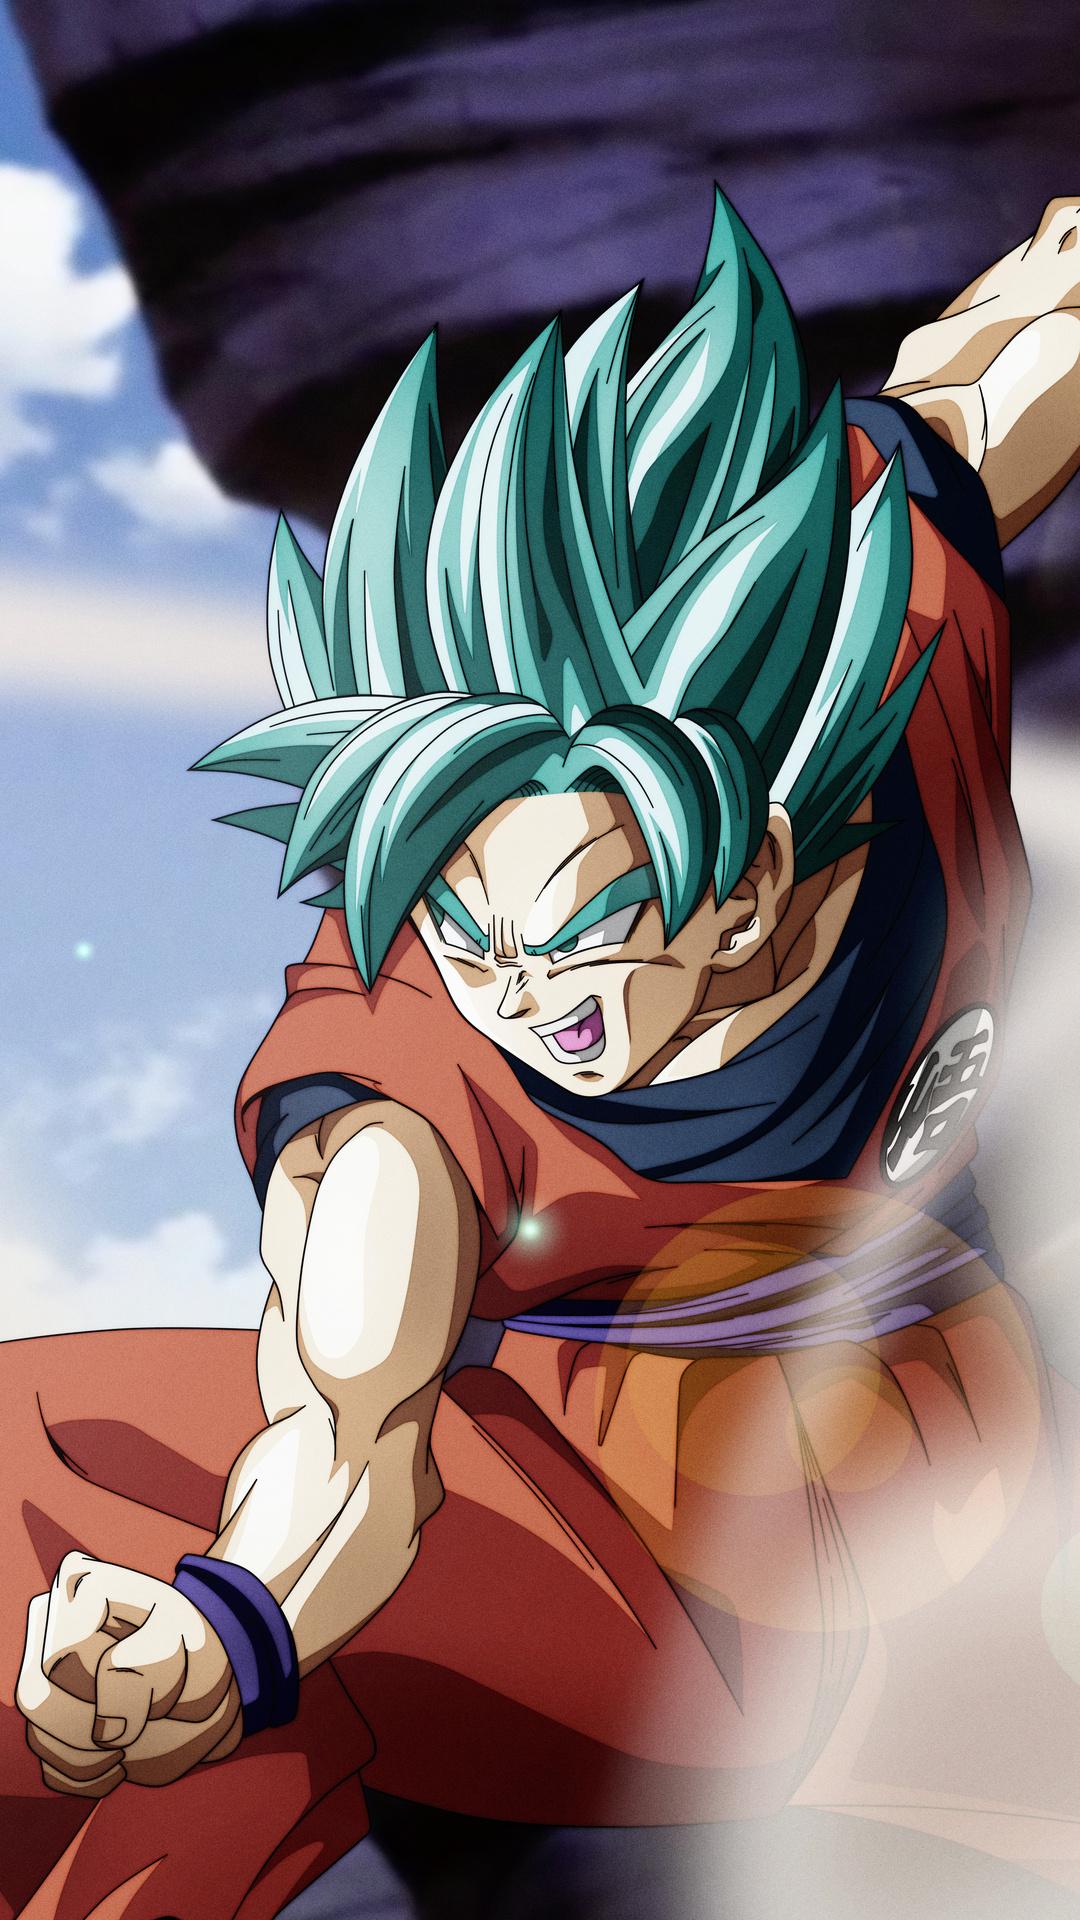 Elegant Goku Super Saiyan 3 Hd Wallpaper Dragon Ball Live